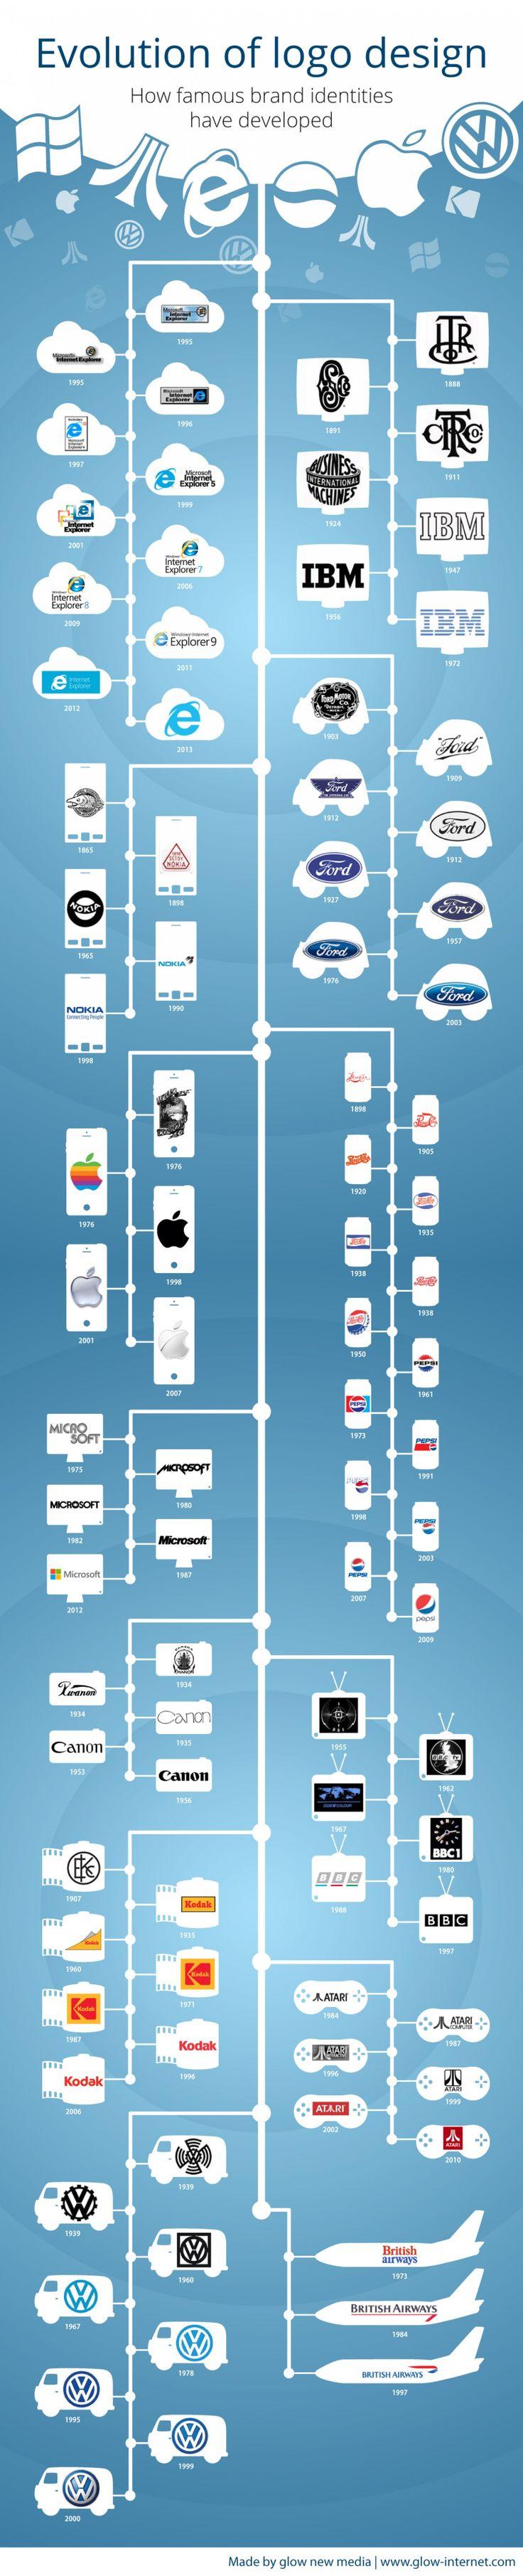 Evolution of Logo Design Infographic